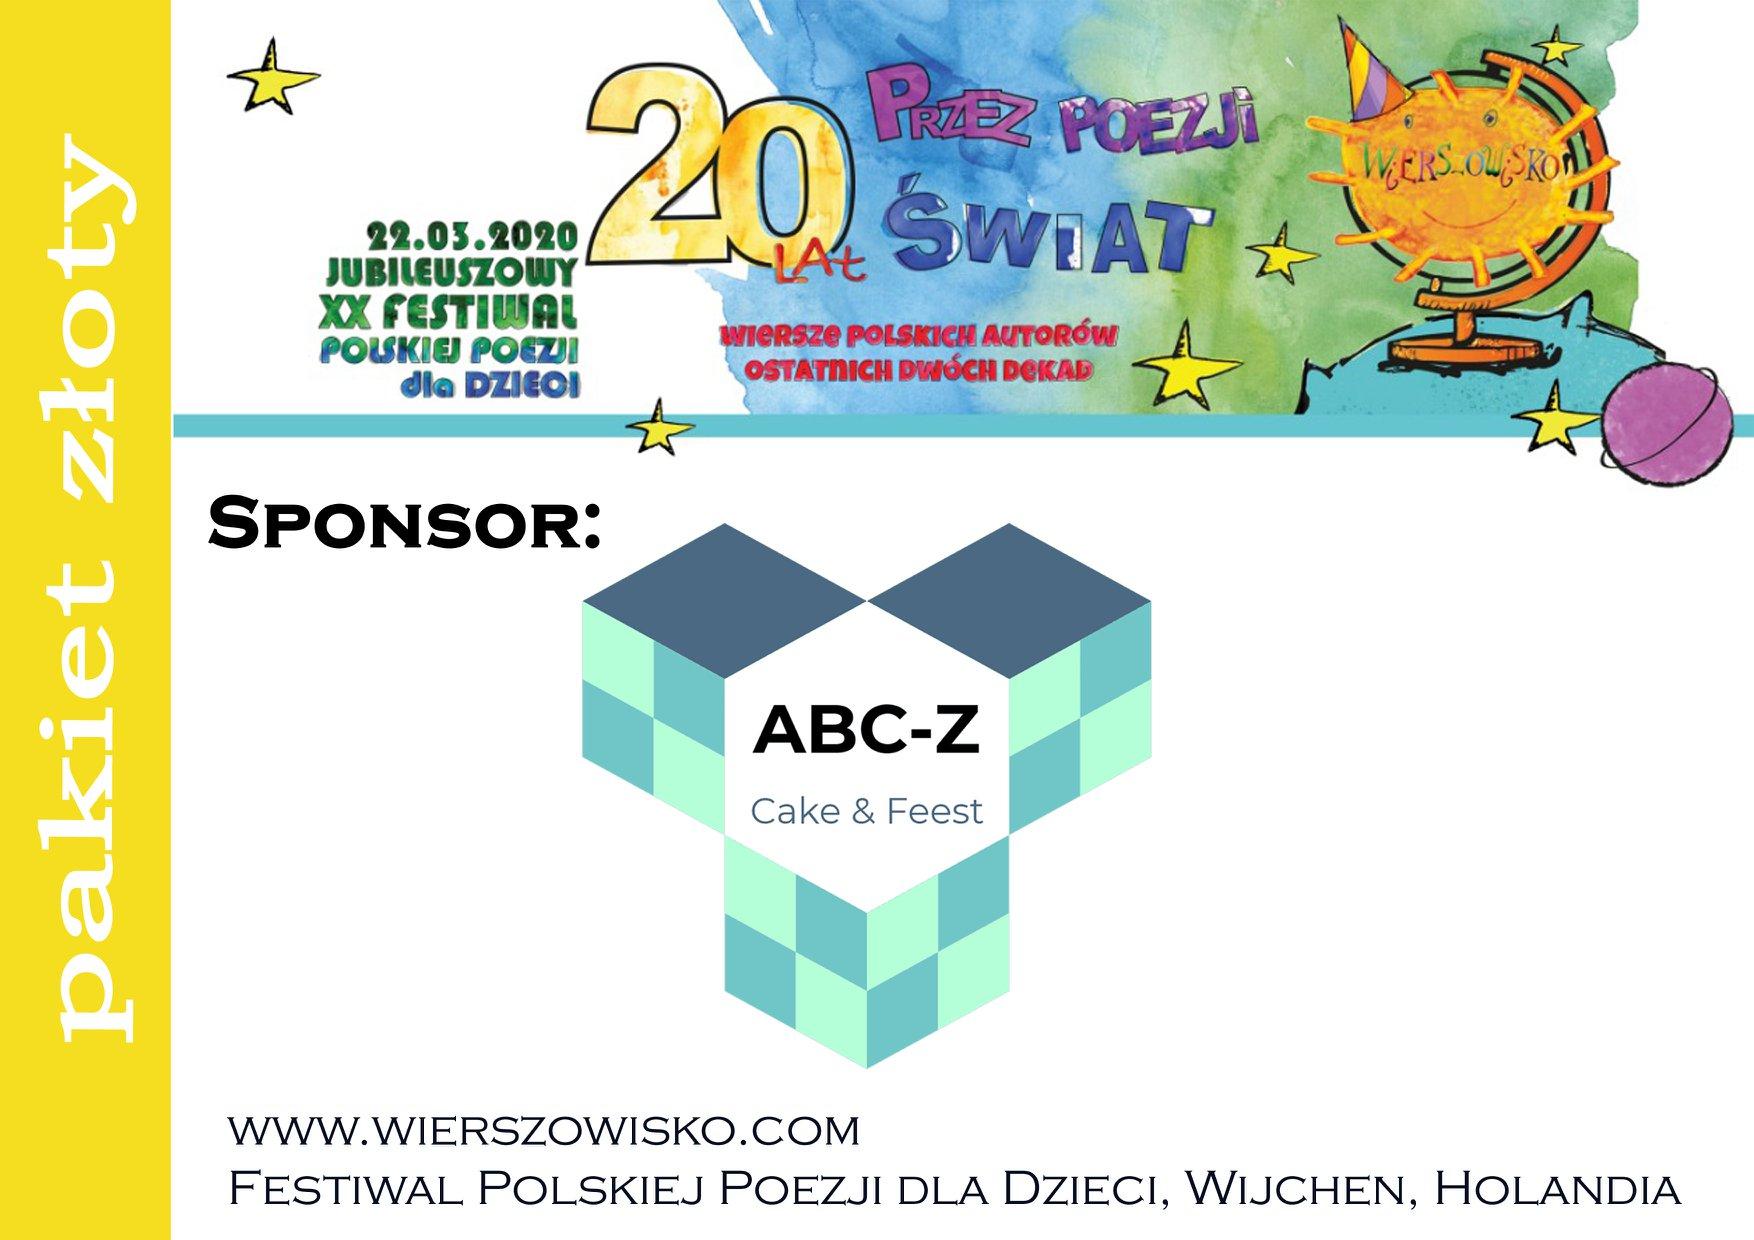 ABC-Z Cakes